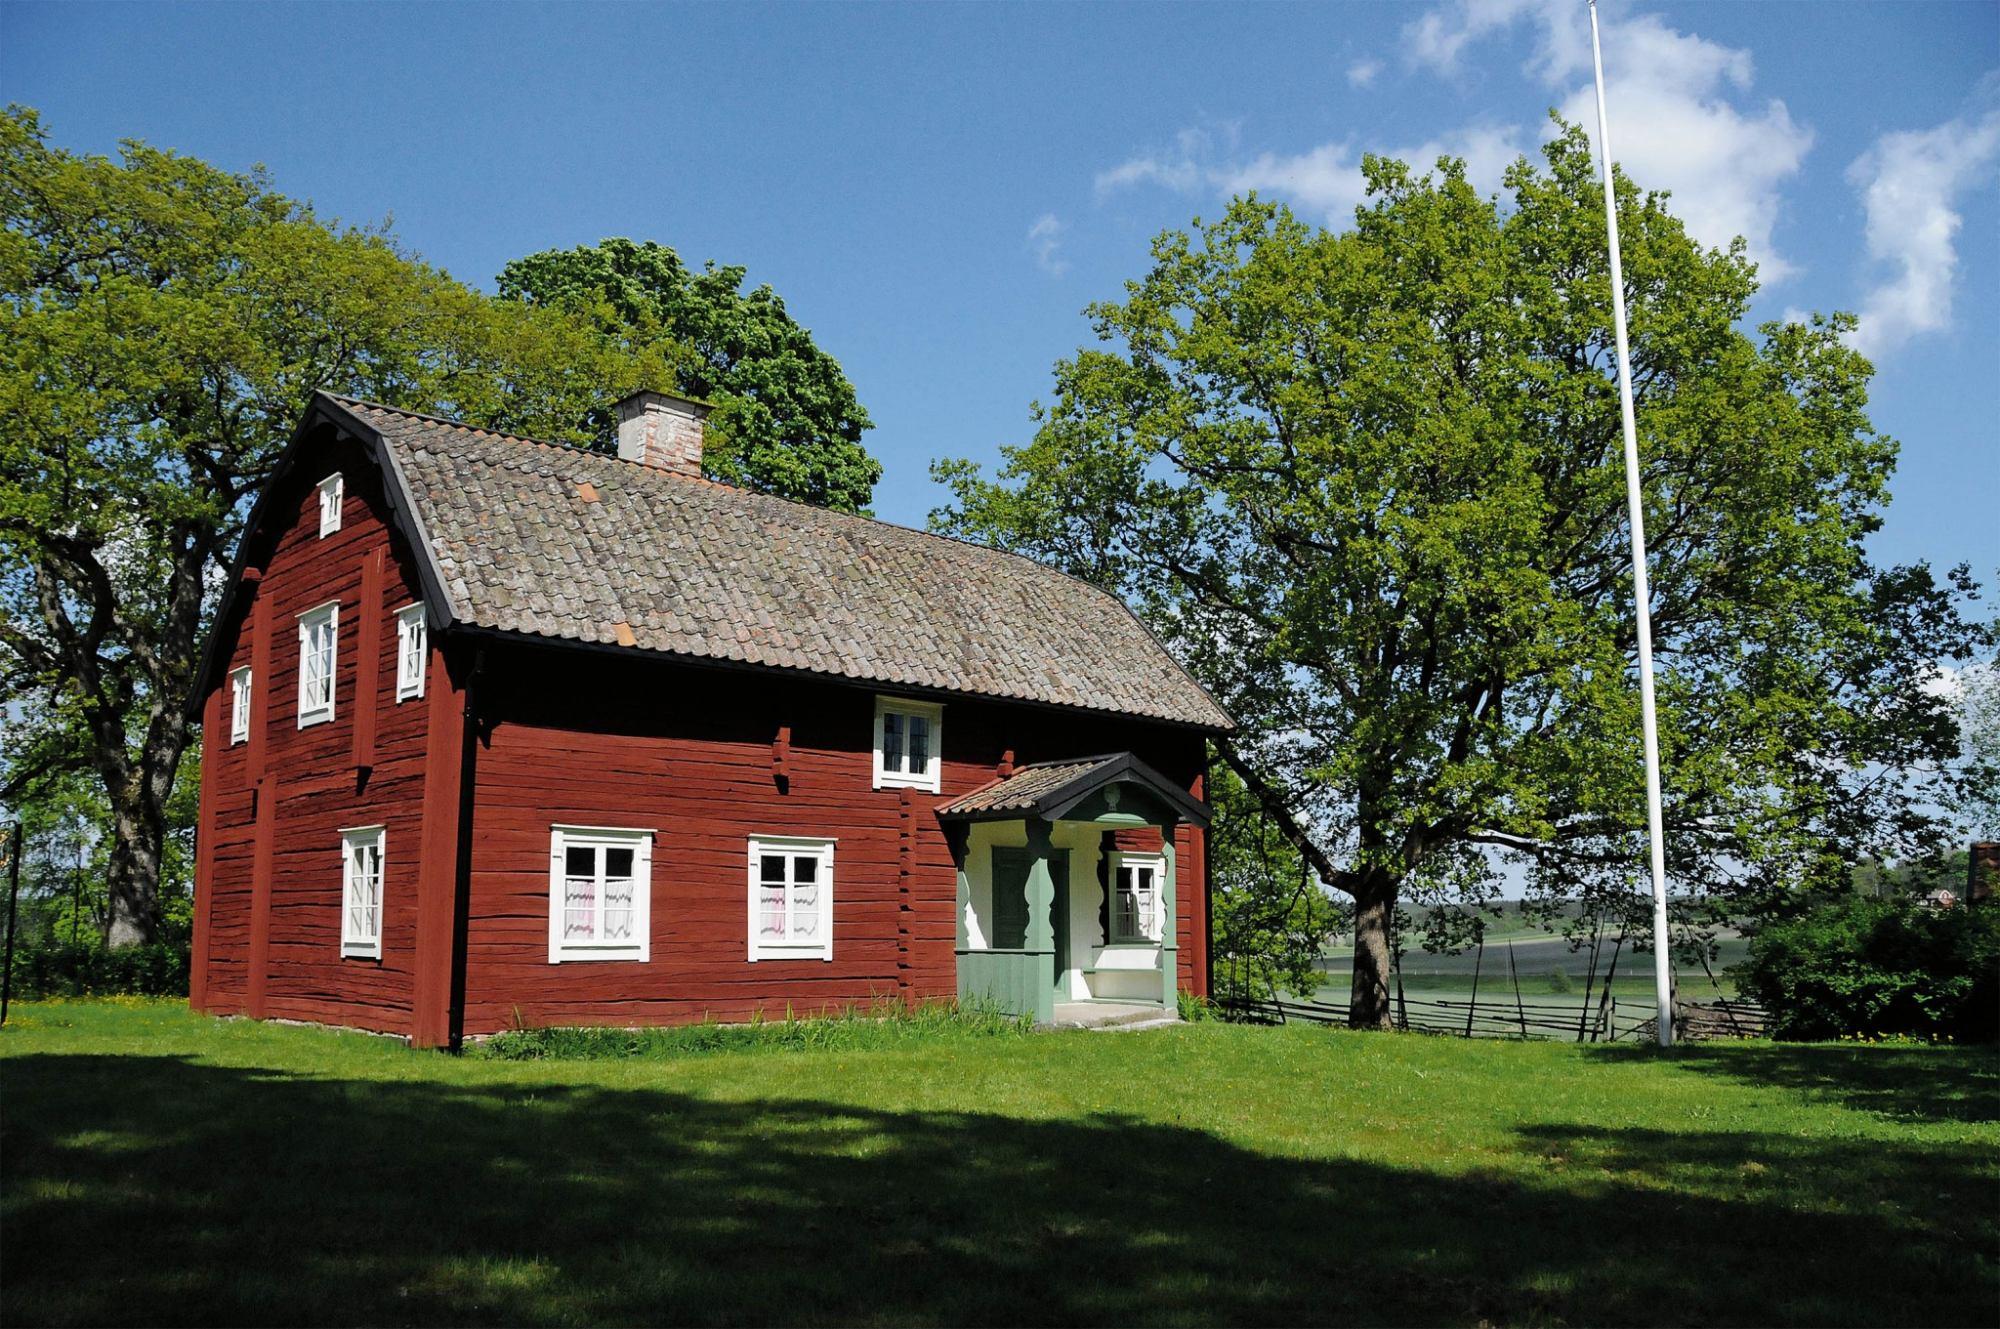 Fröslunda hometown farm. Photo: Katja Jahn